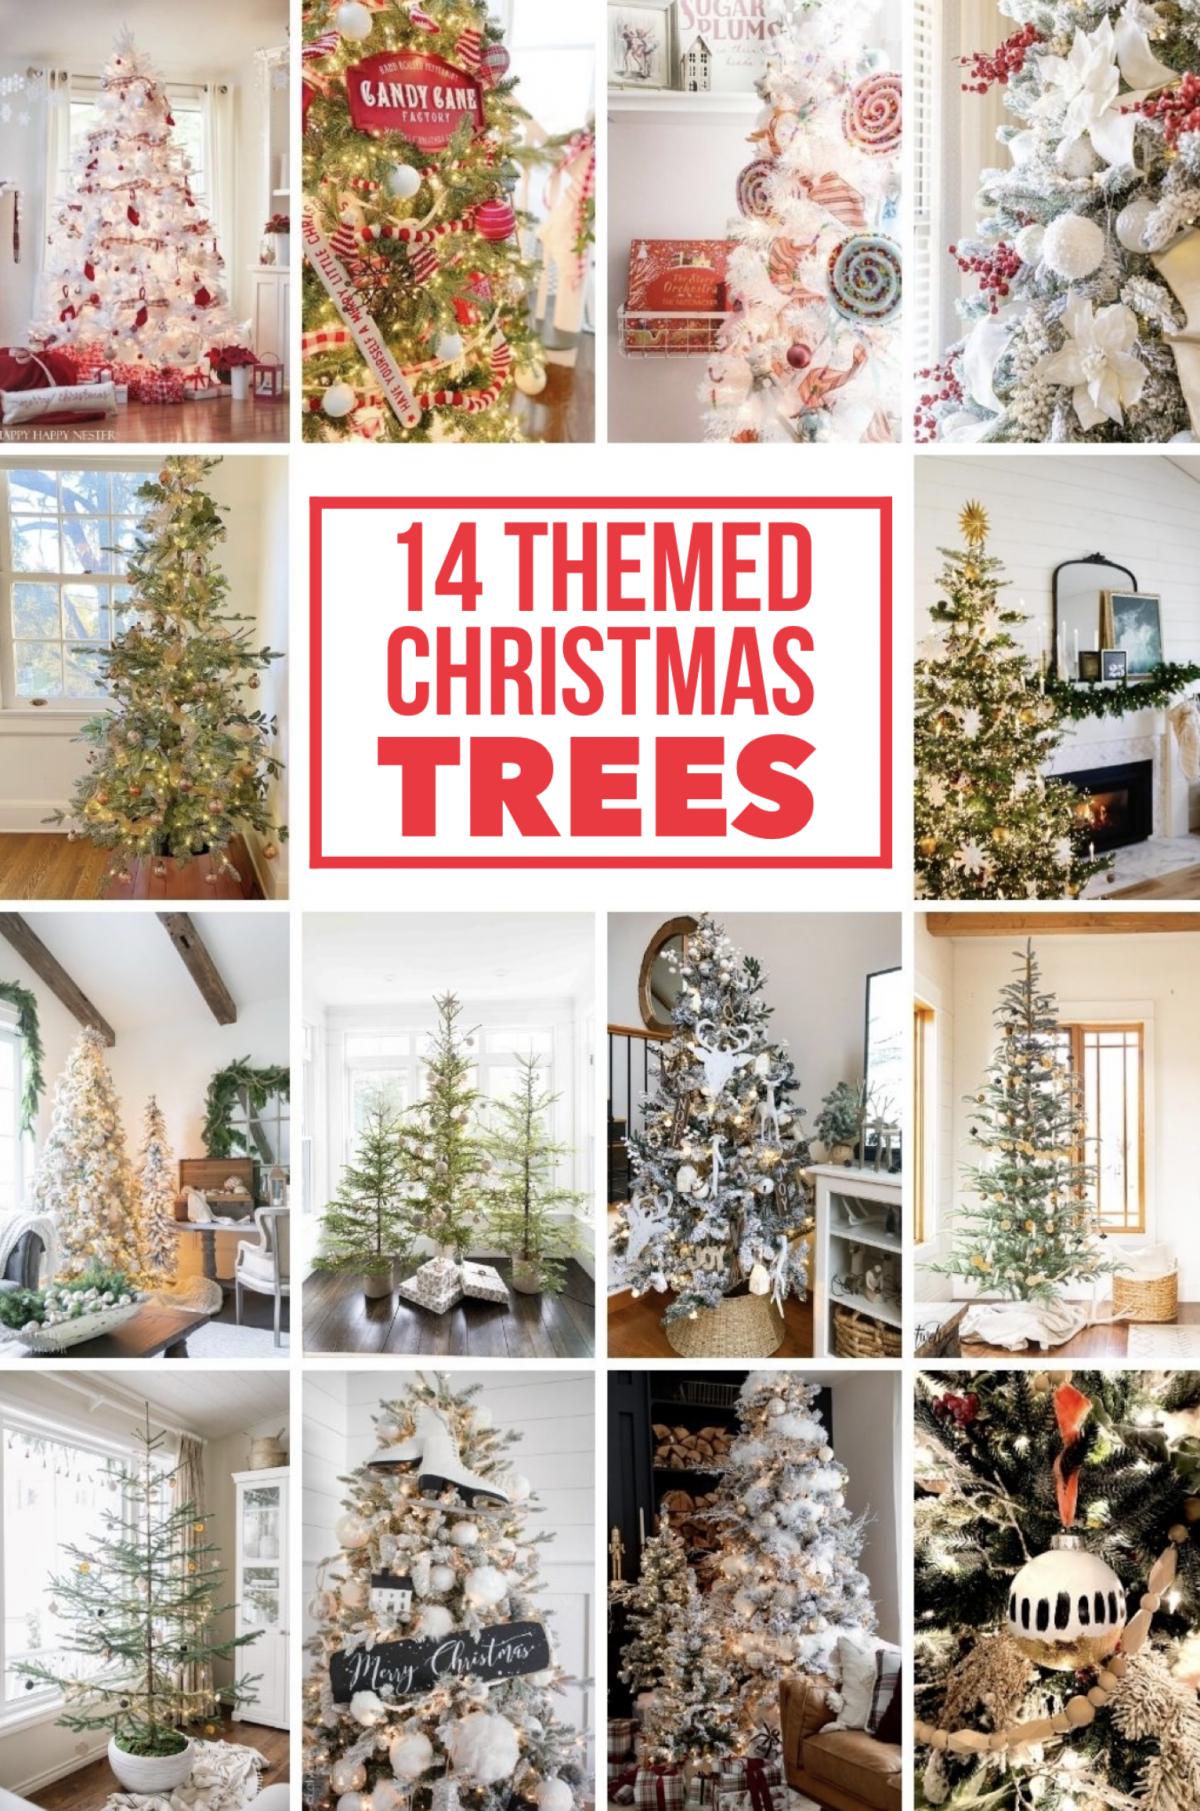 14 themed Christmas Trees